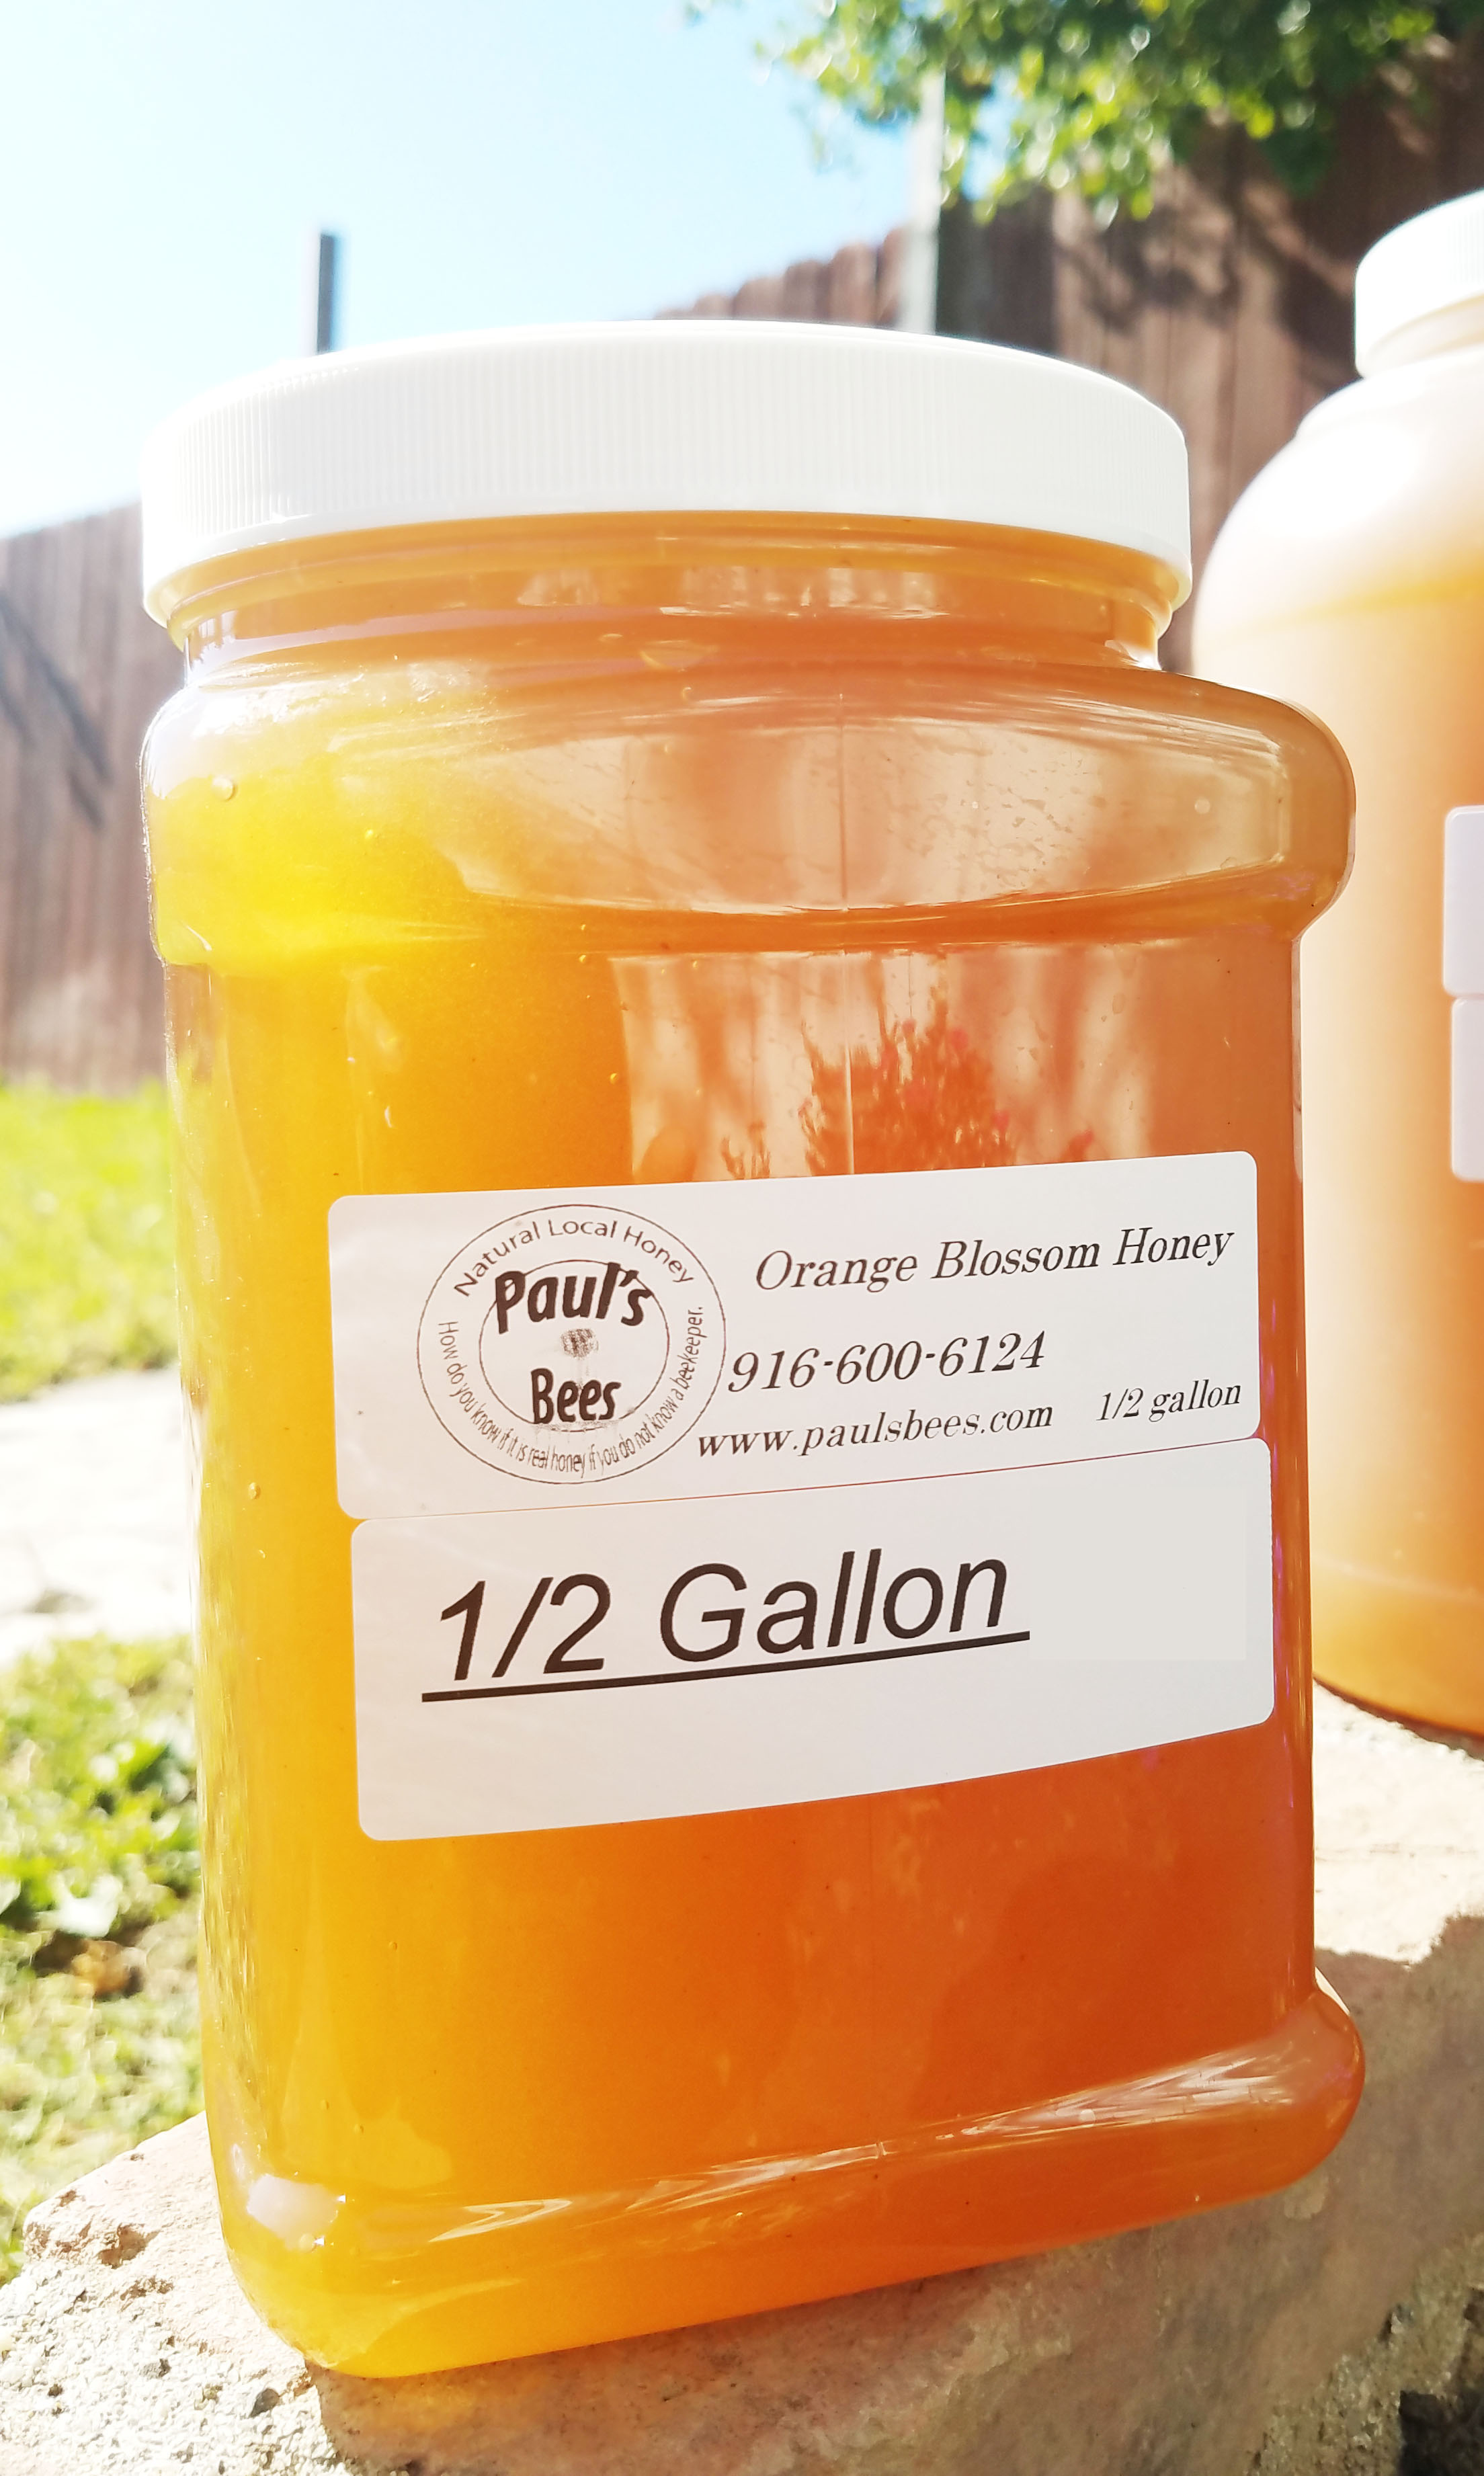 Orange Blossom Honey 1/2 gallon